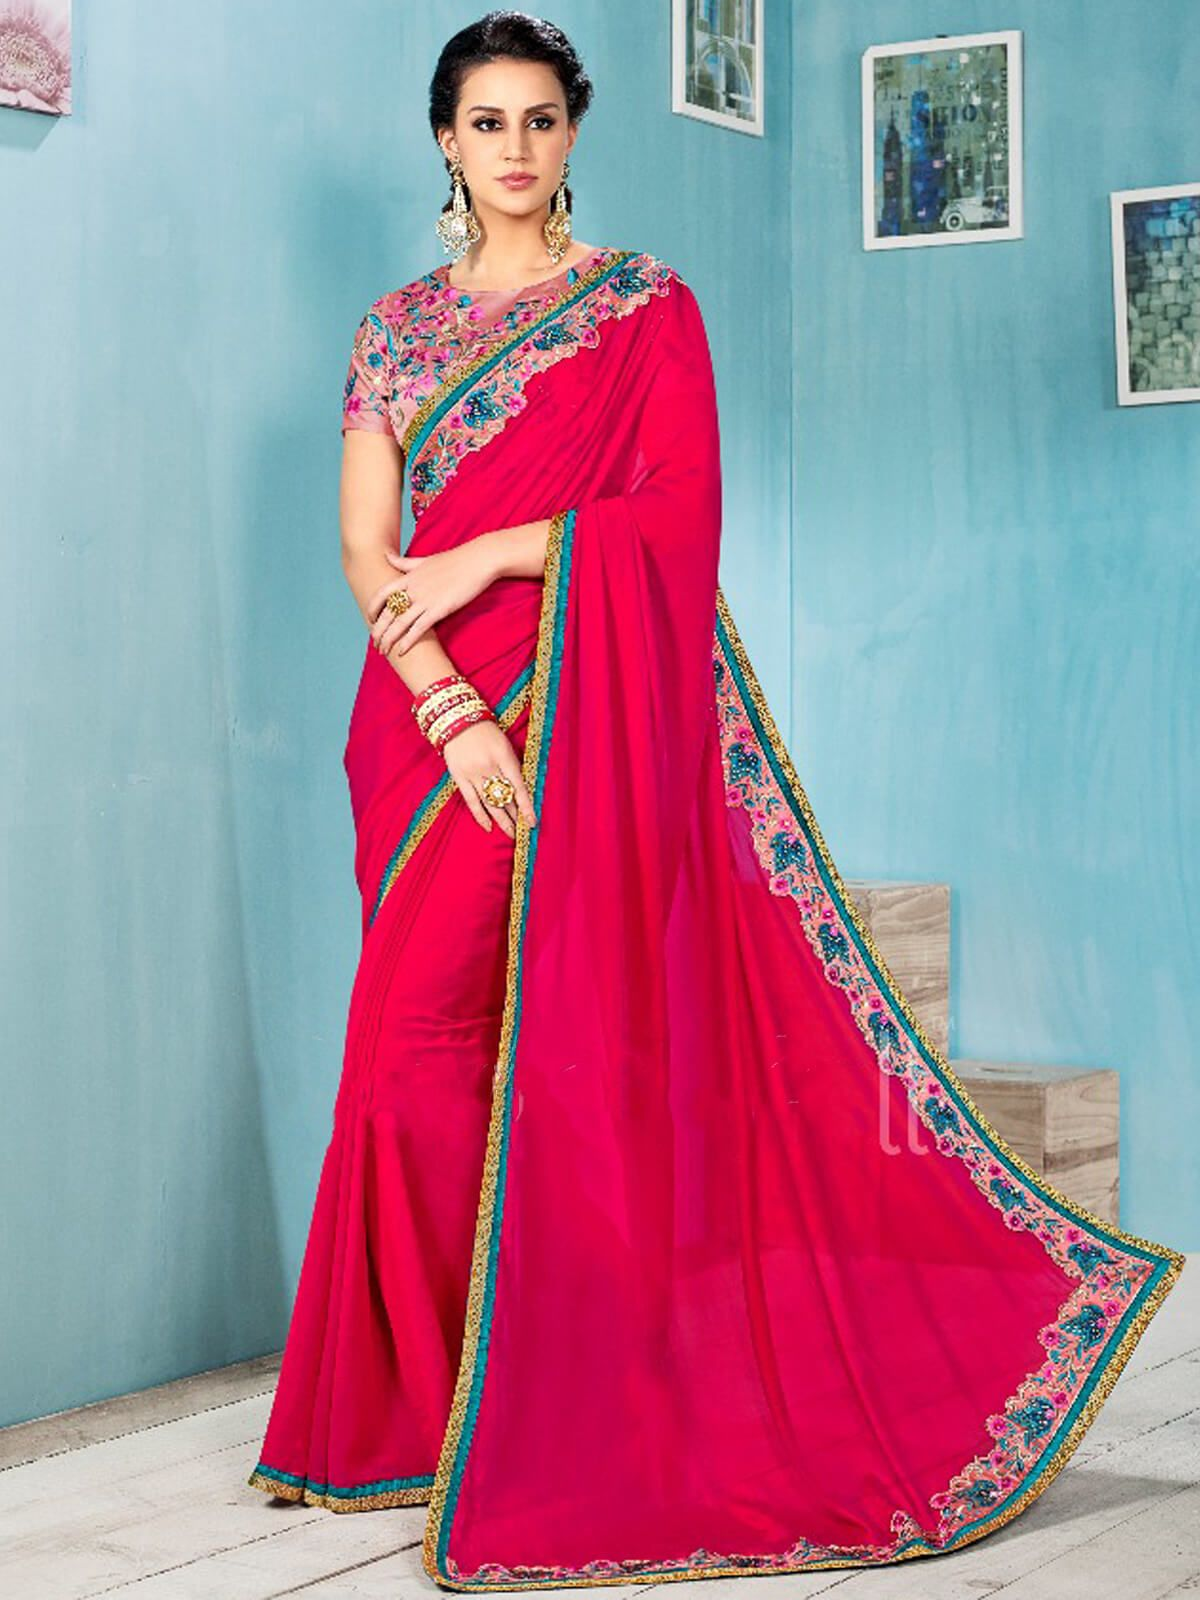 Sparky pink chiffon ceremonial wear designer saree having fabric